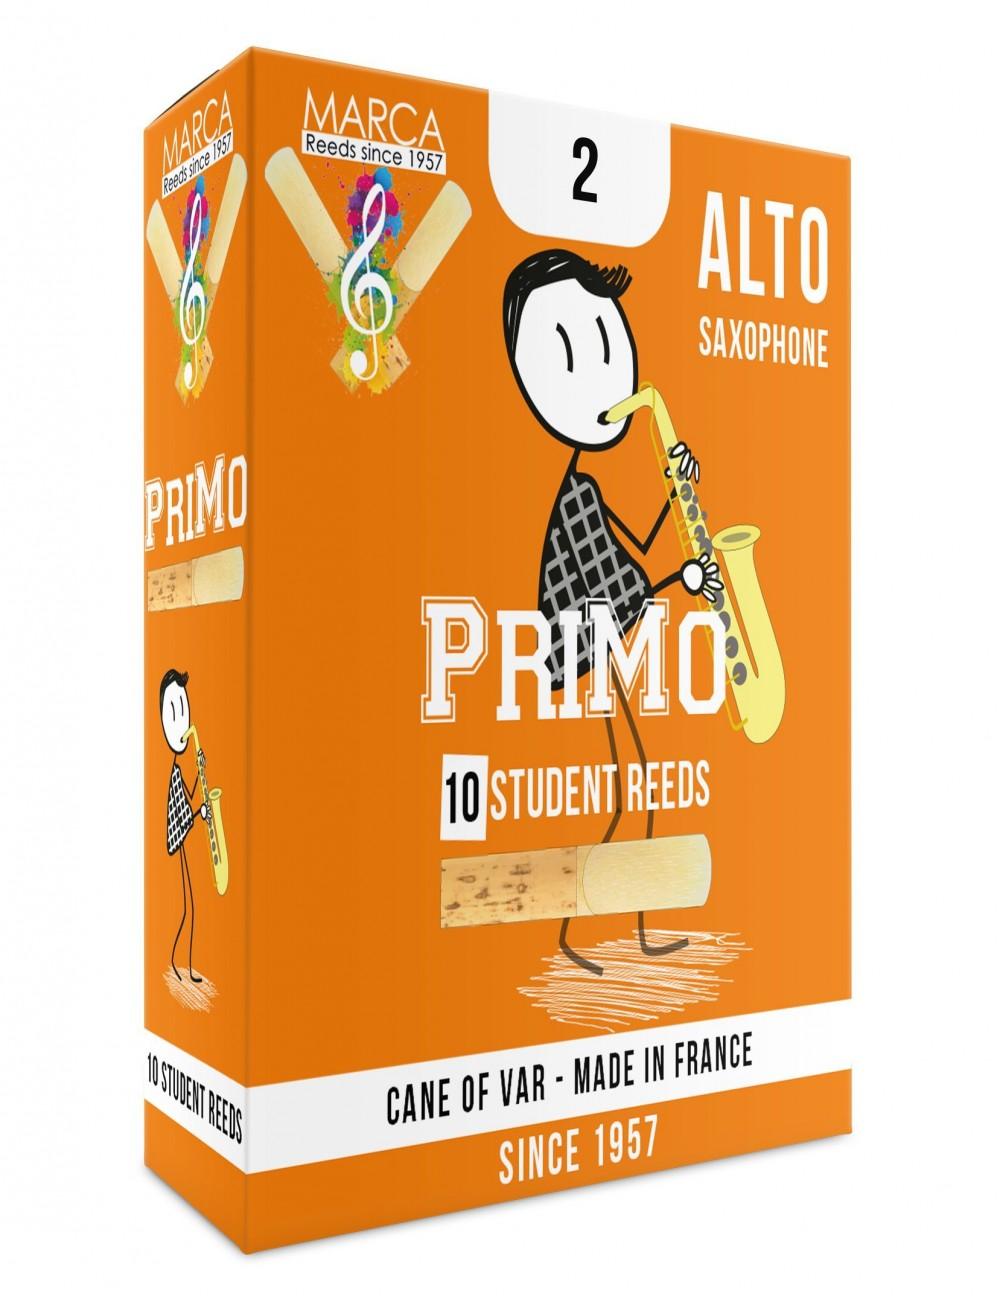 10 REEDS MARCA PriMo ALTO SAXOPHONE 2